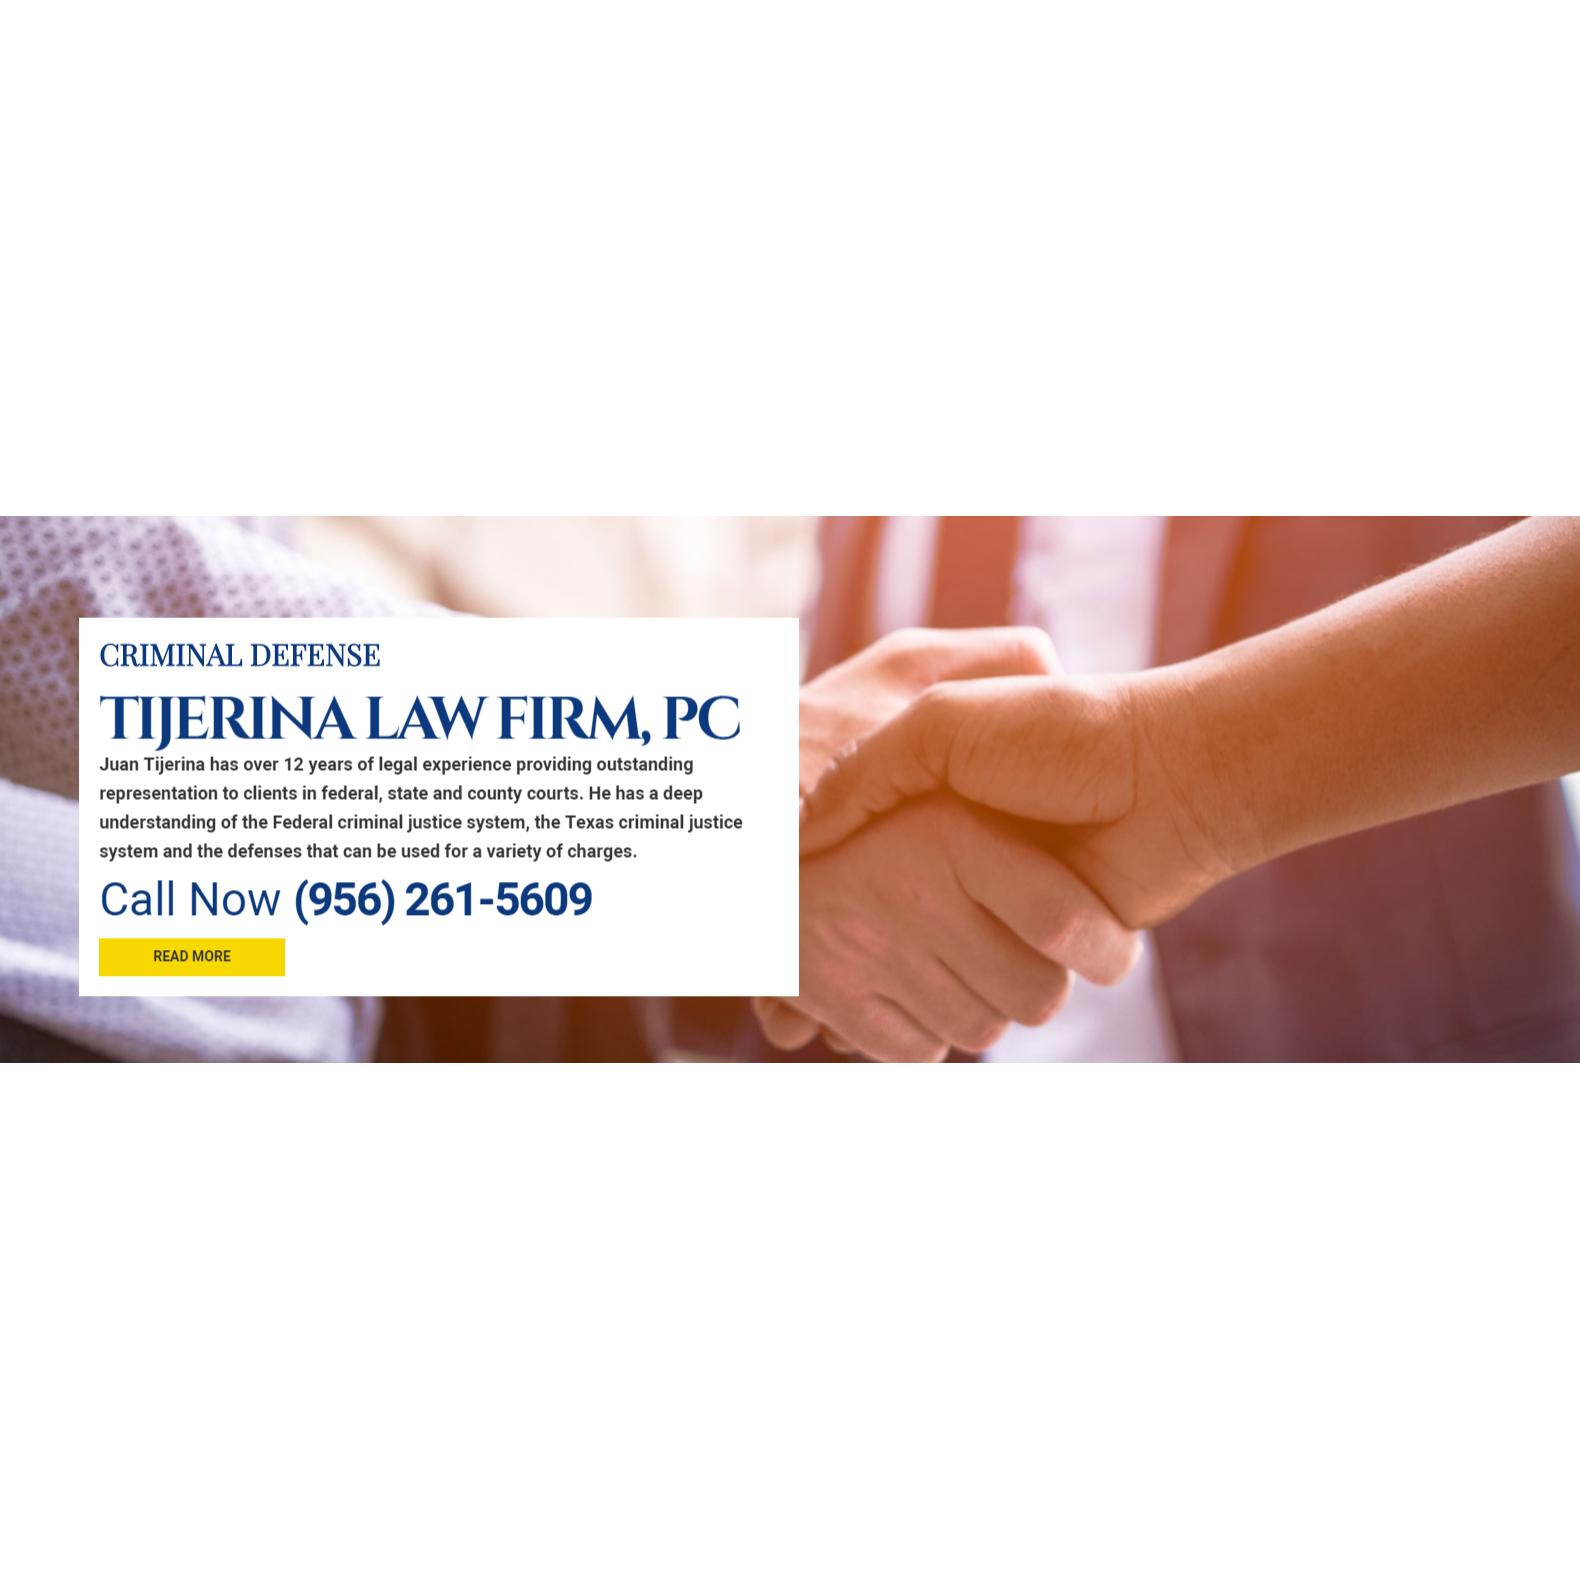 Tijerina Law Firm, PC